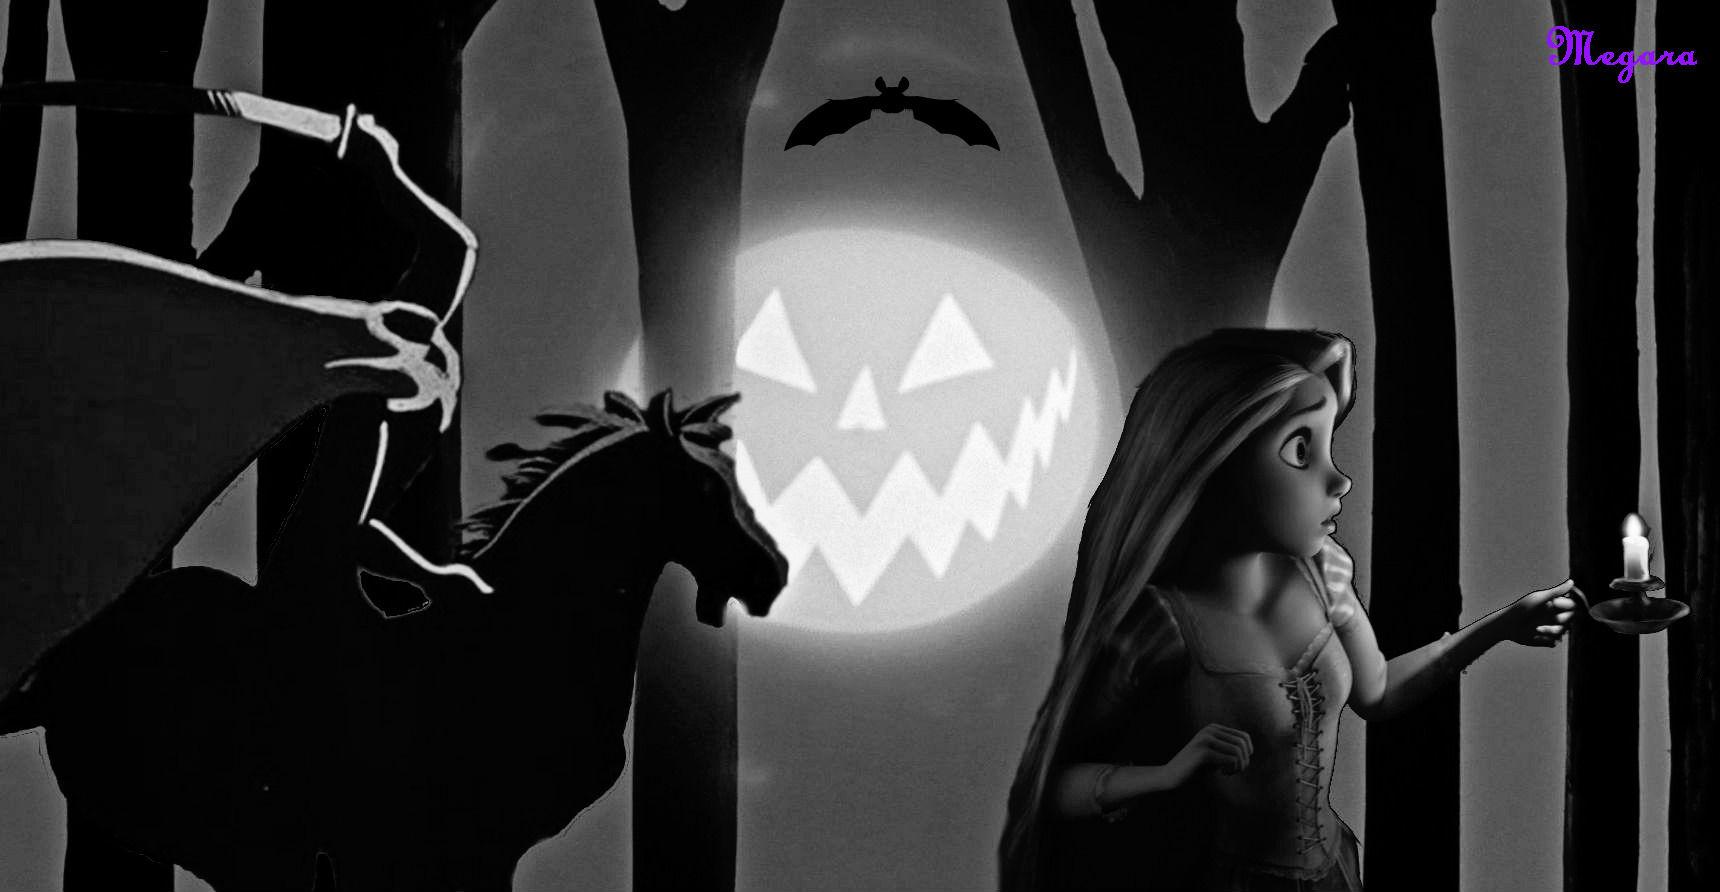 On Хэллоуин Night